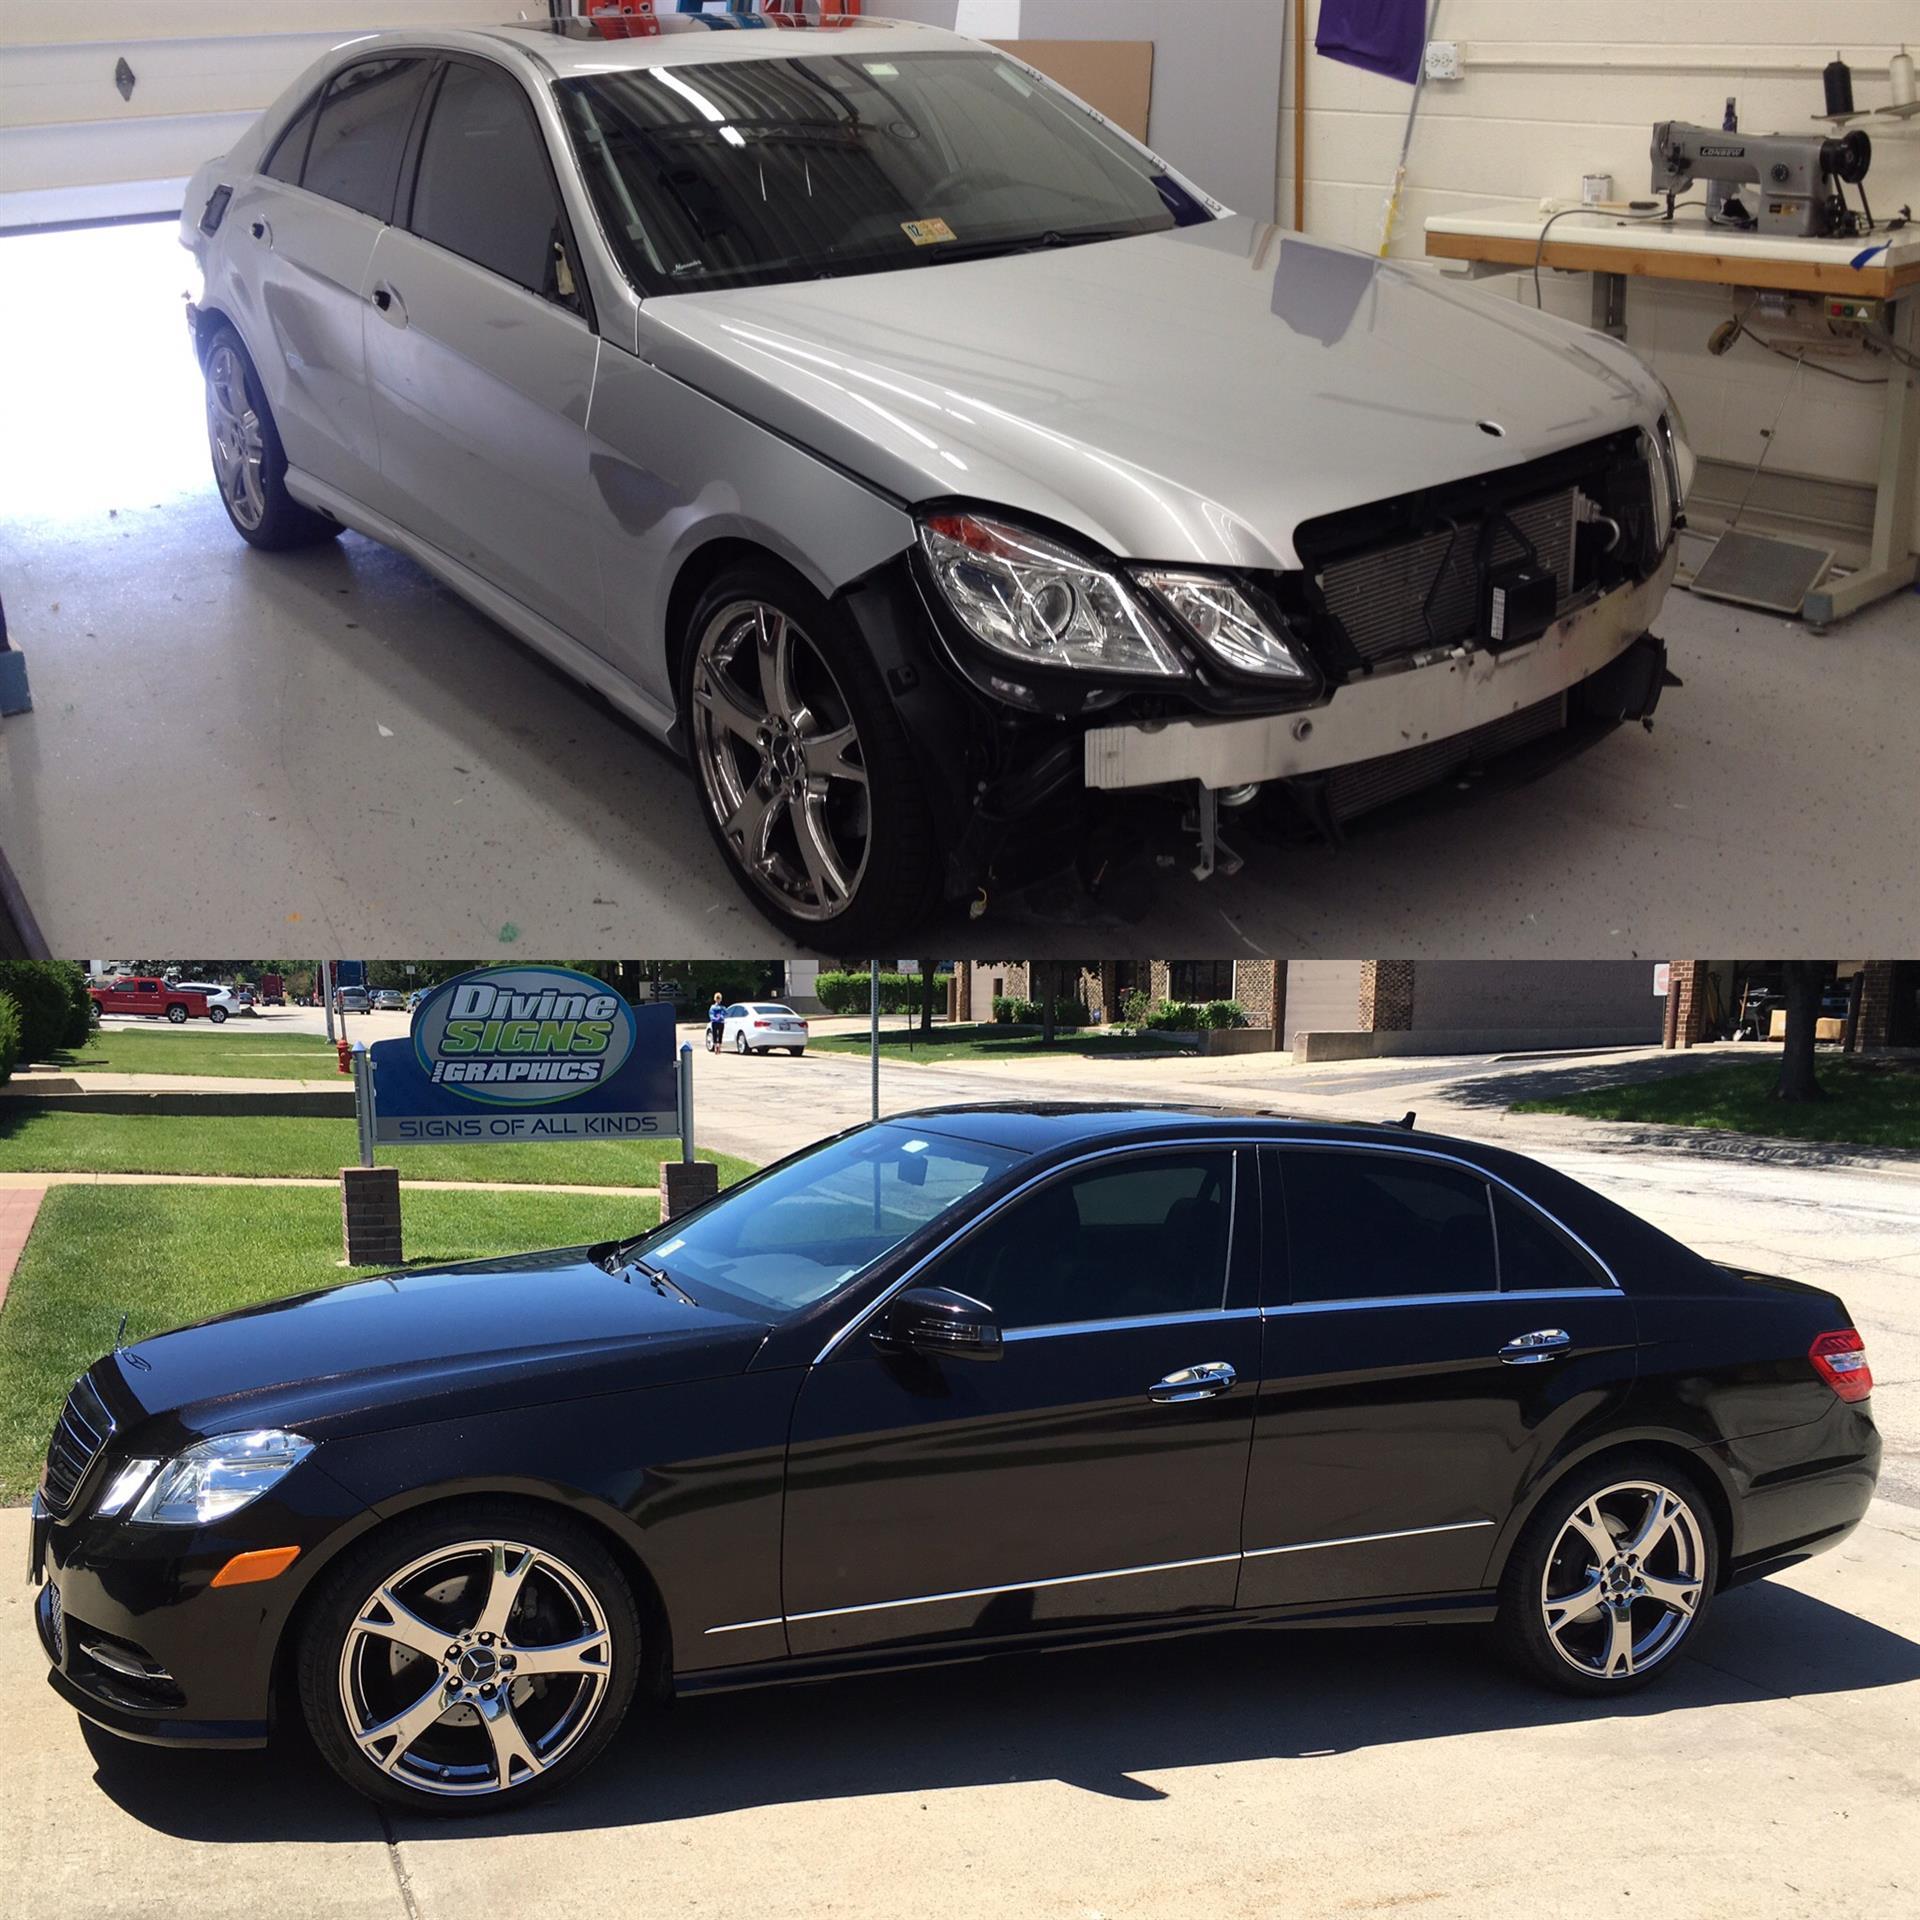 Mercedes-Benz Car Wrap!